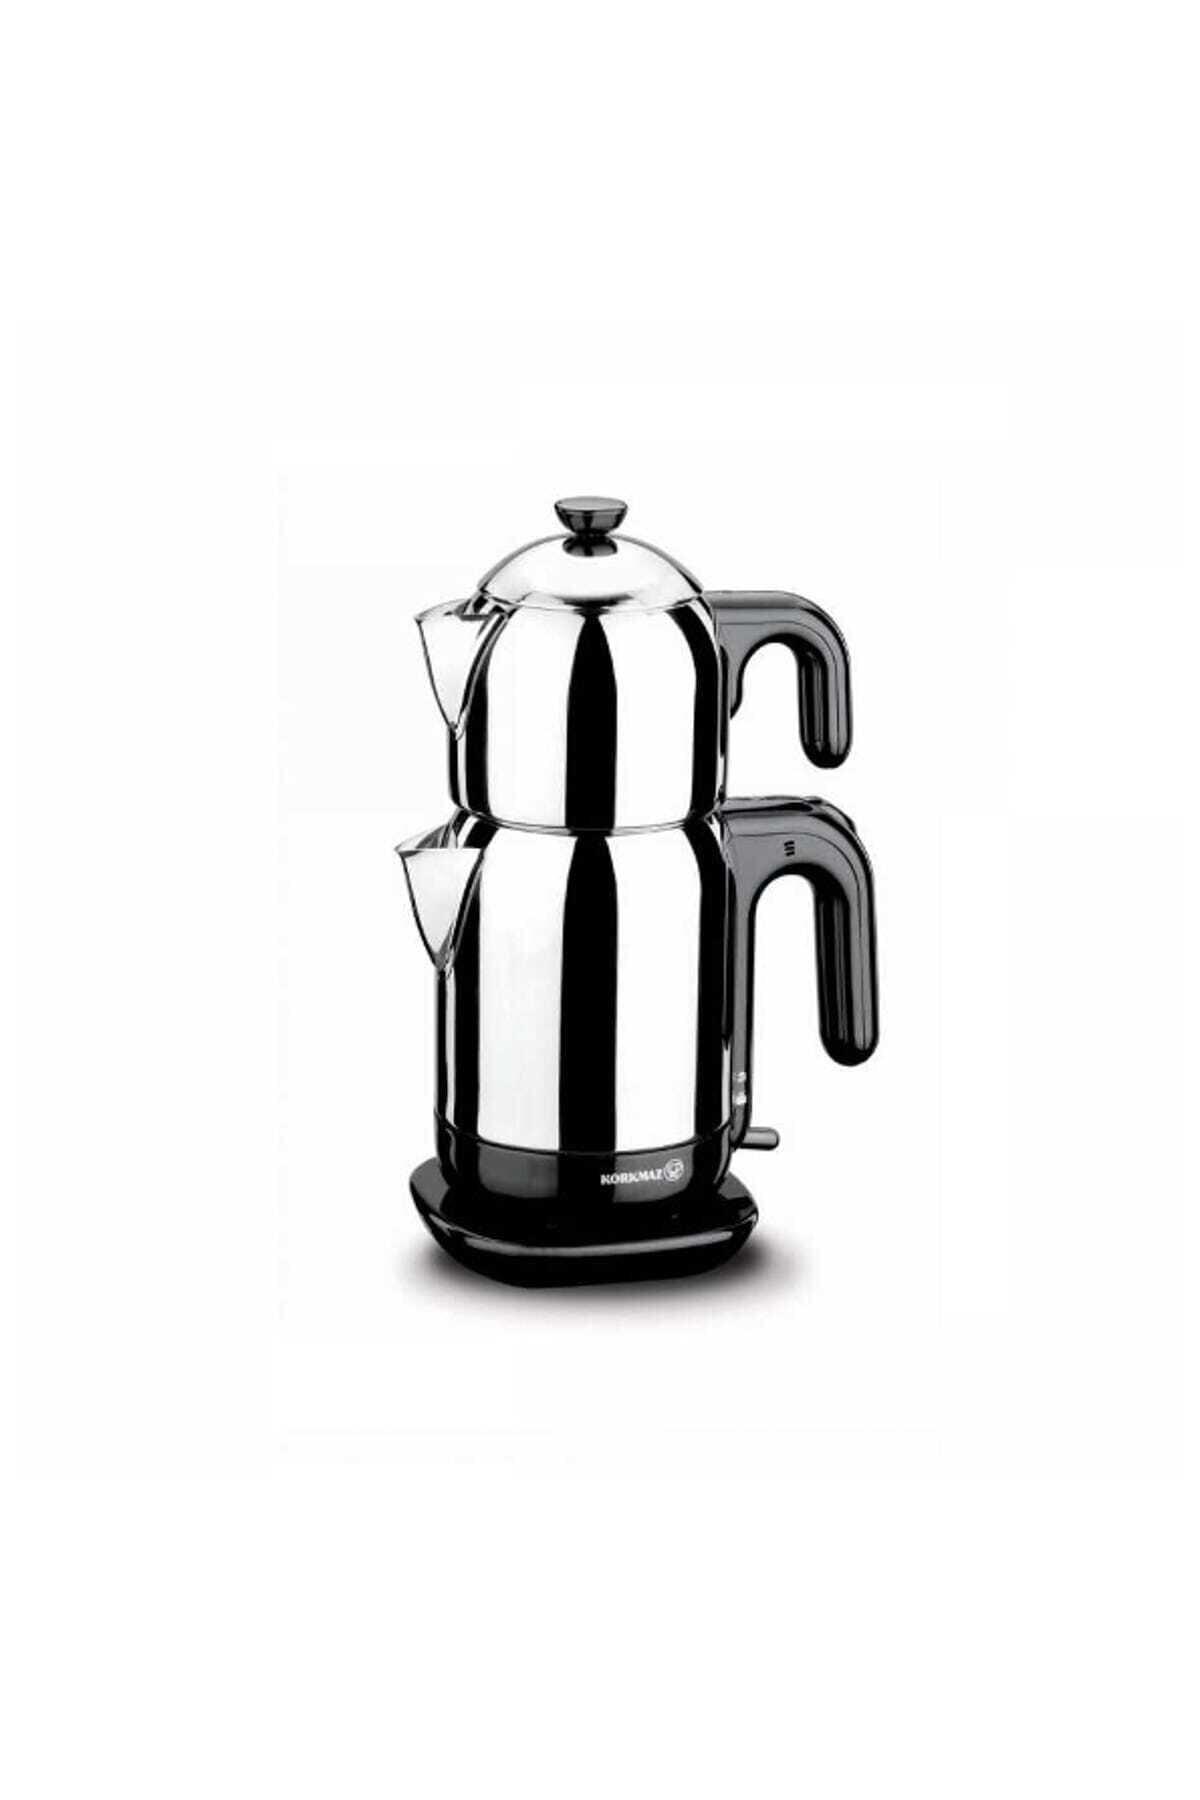 KORKMAZ Demtez Inox/siyah Elektrikli Çaydanlık 1